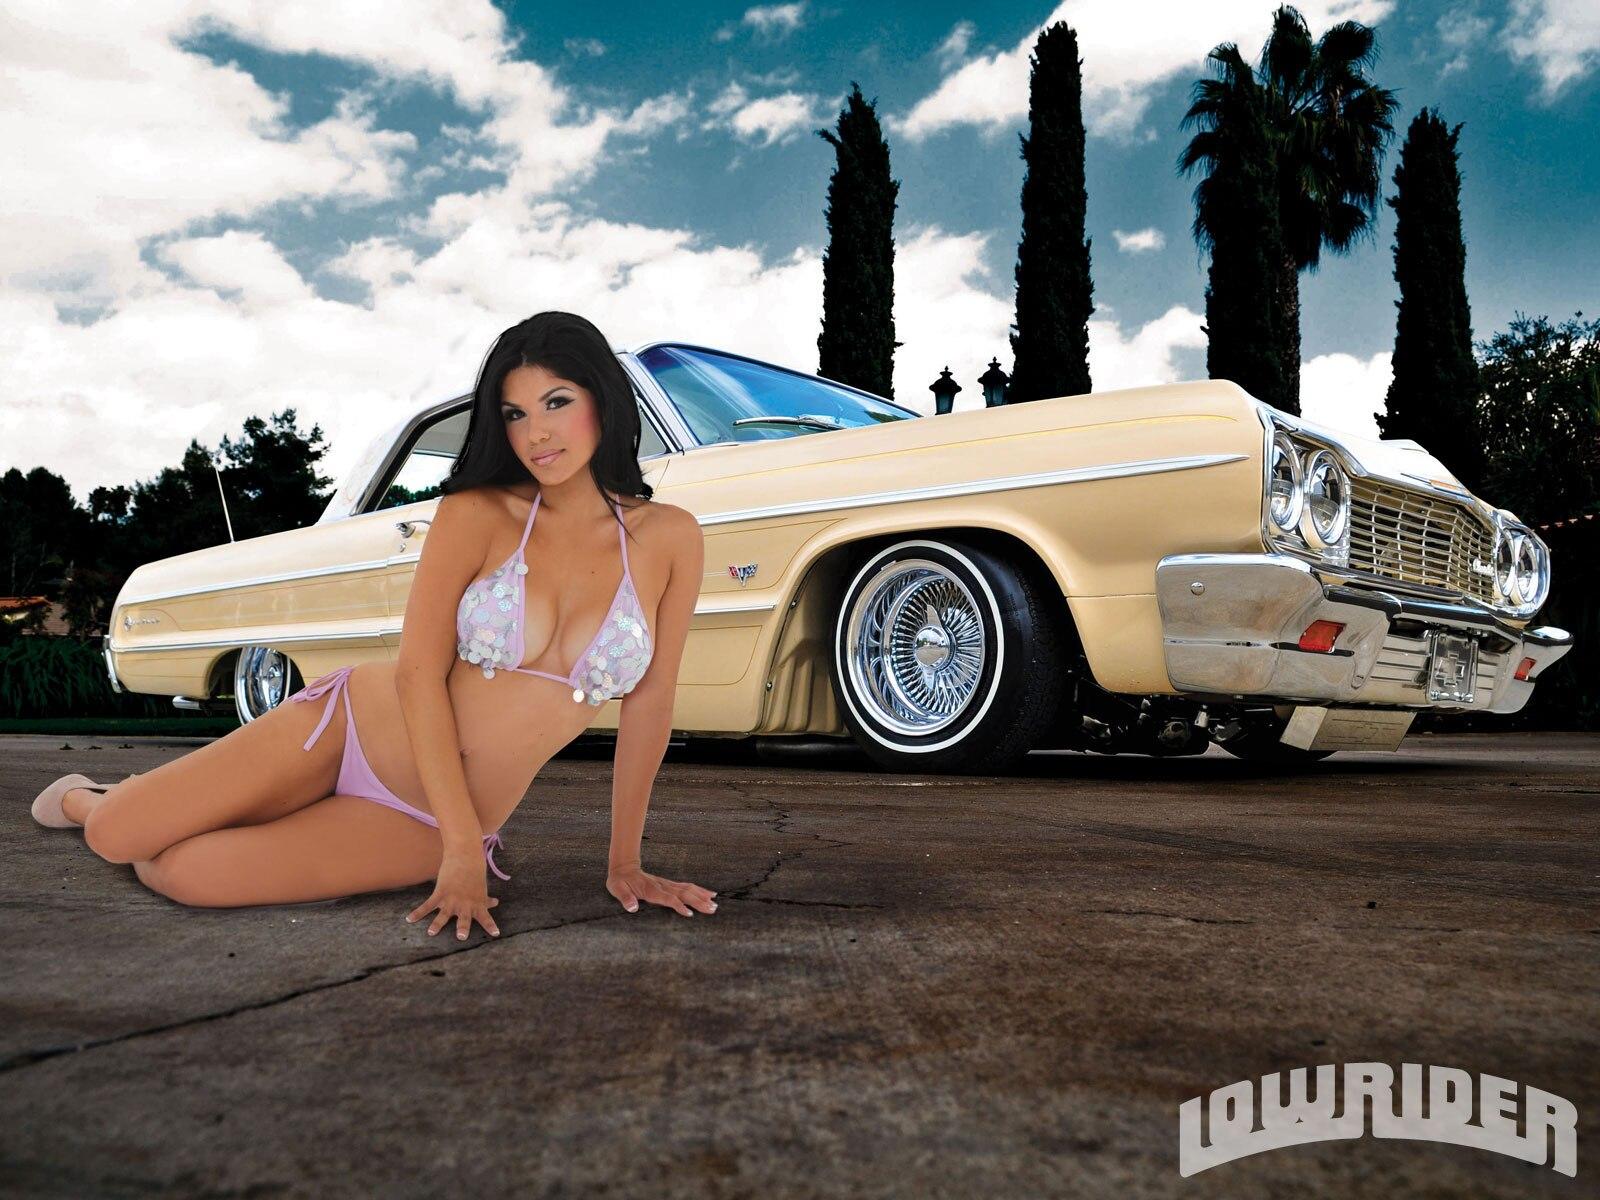 1111-lrmp-02-o-1964-chevrolet-impala-krista-gonzales2